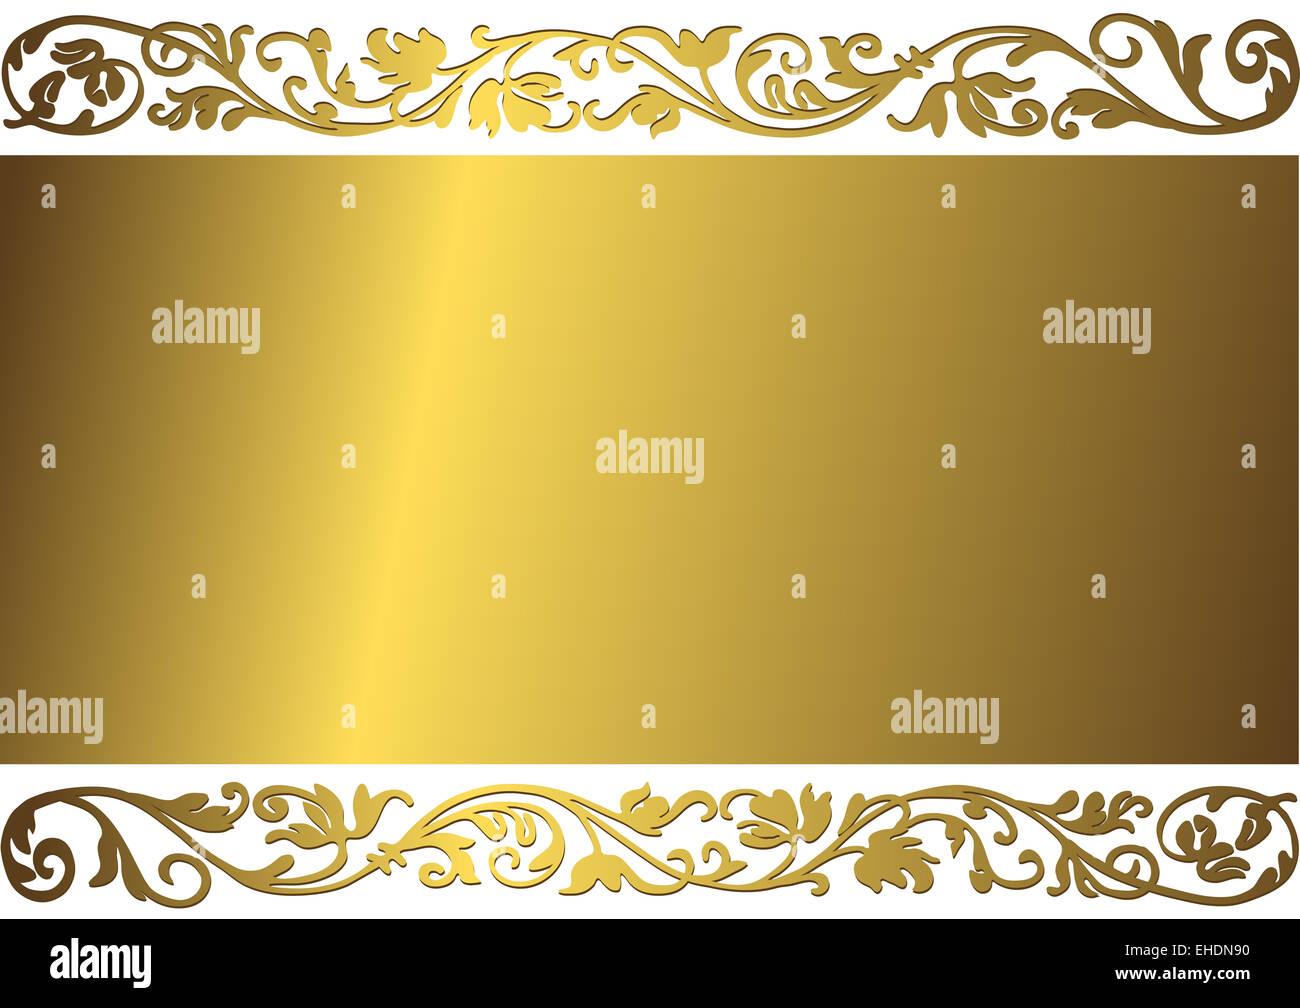 Gentle golden frame - Stock Image